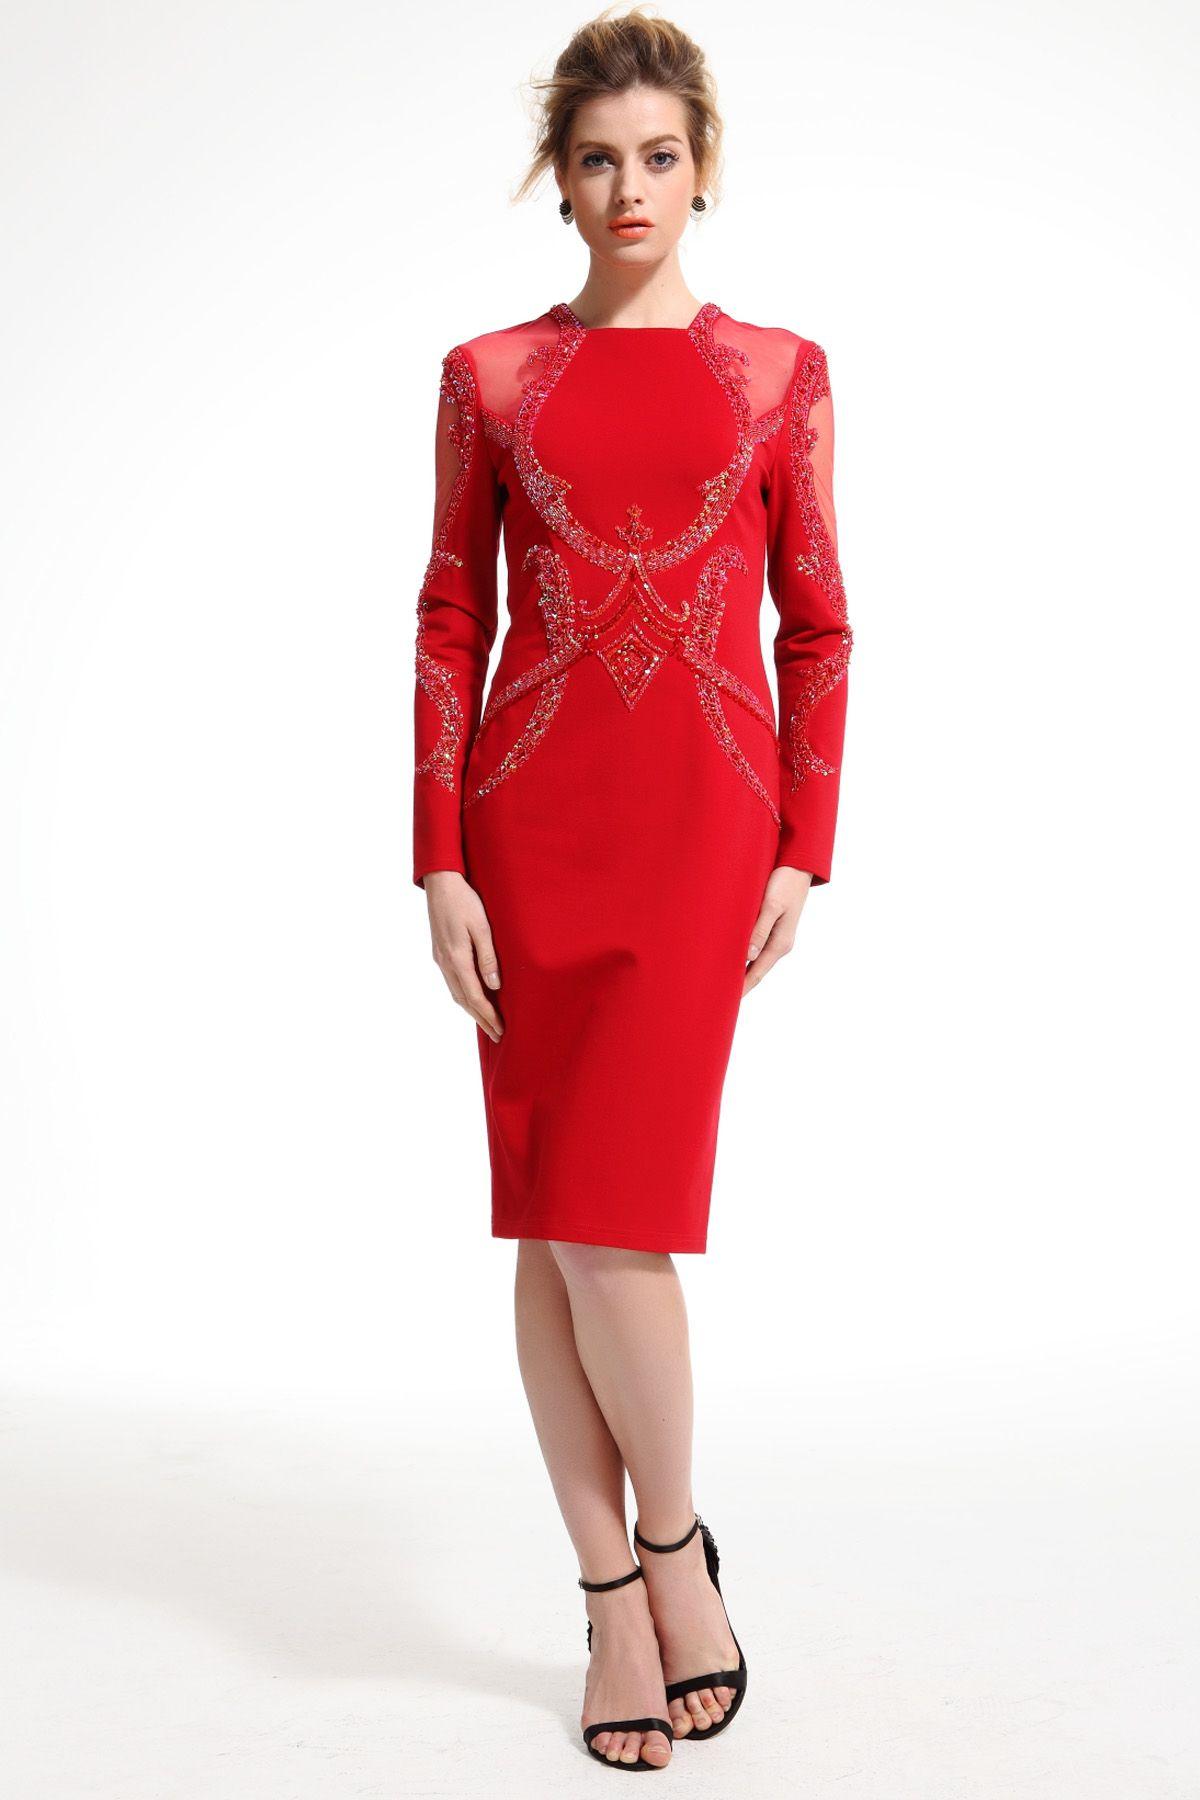 Autumn Style Wholesale Clothing Latest Designs Transparent Long ...